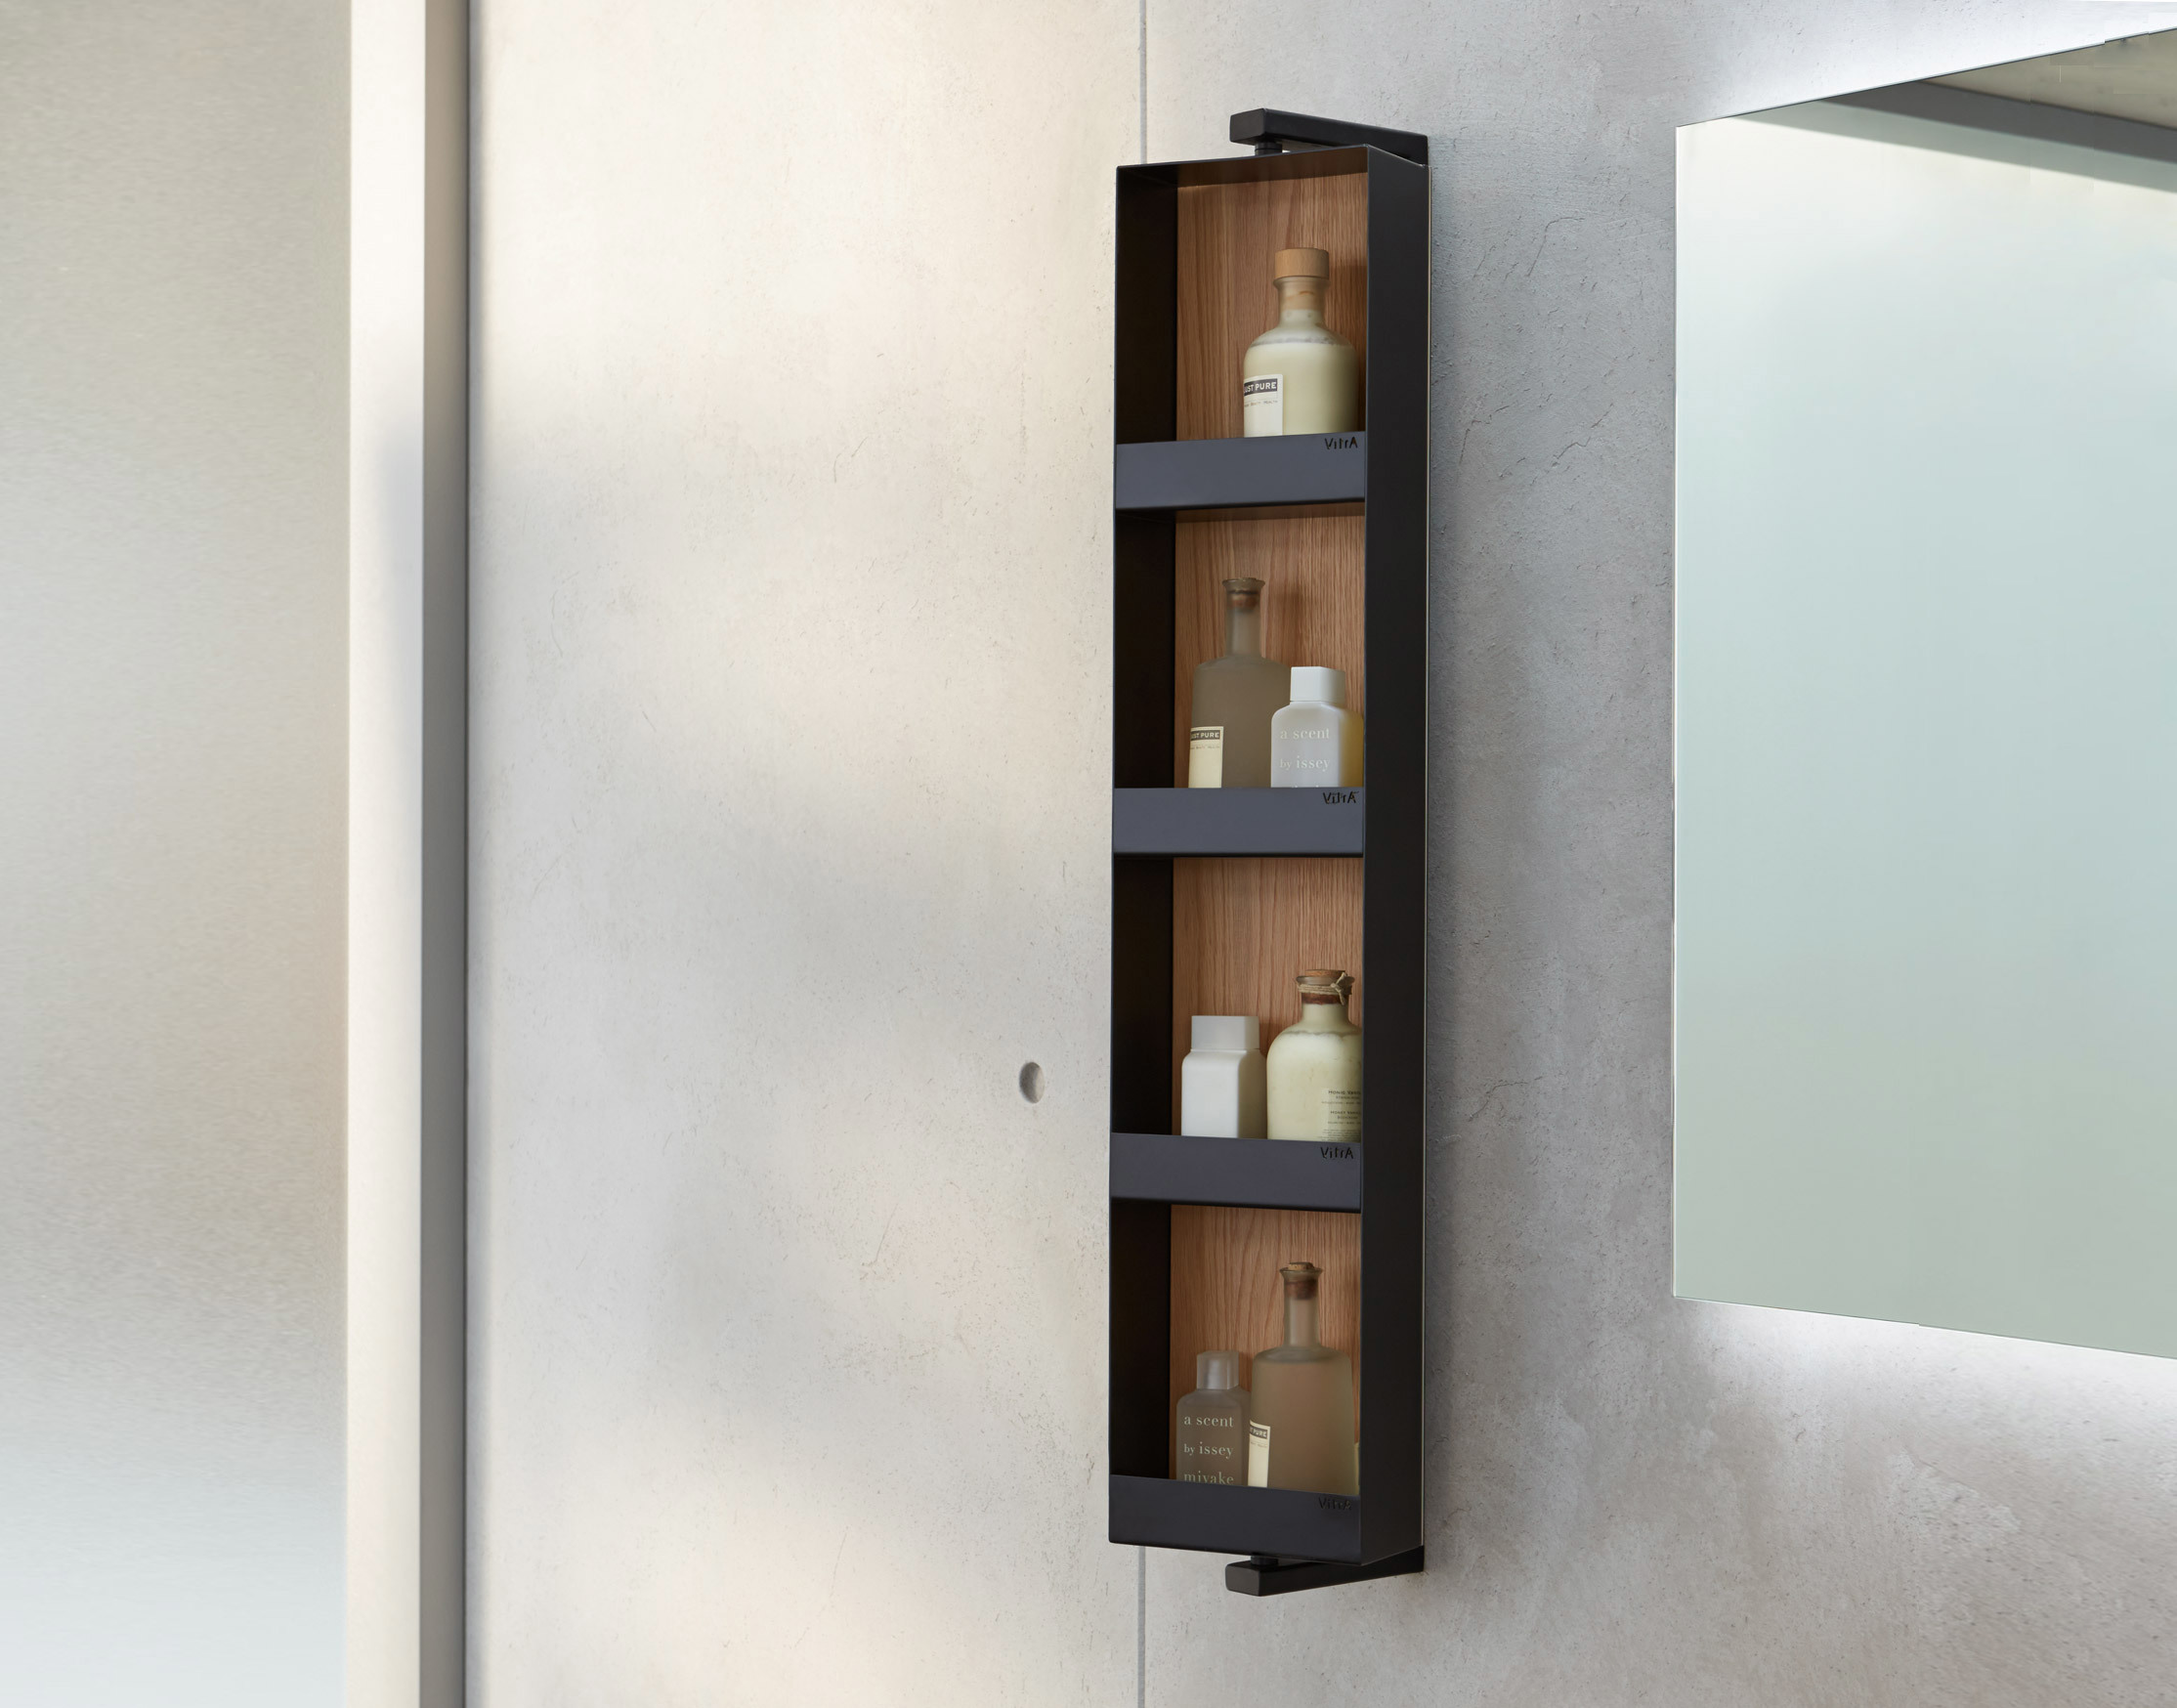 frame mirror with aluminum decor electric pdx wade reviews pillows shelf logan wayfair wall